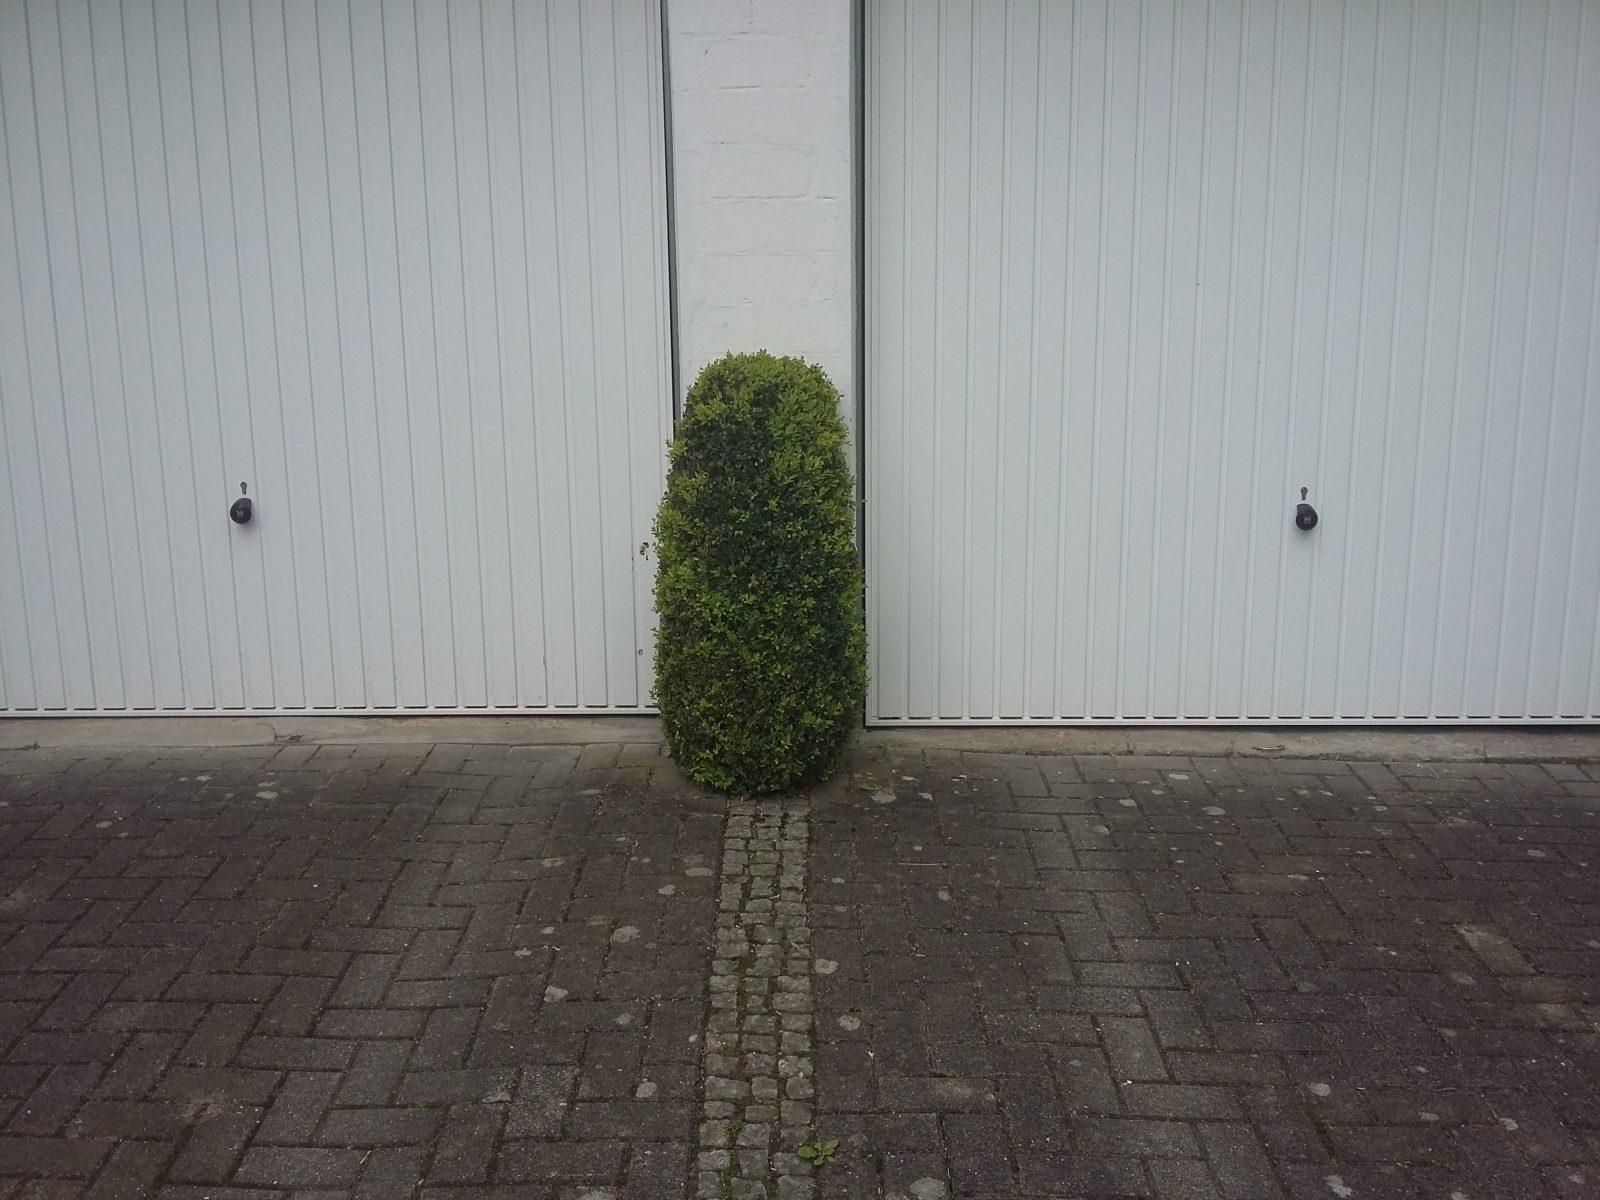 Servicepionier_Servicekomplize_Armin_Nagel_Orte_des_Grauens_Parkplatz (60)